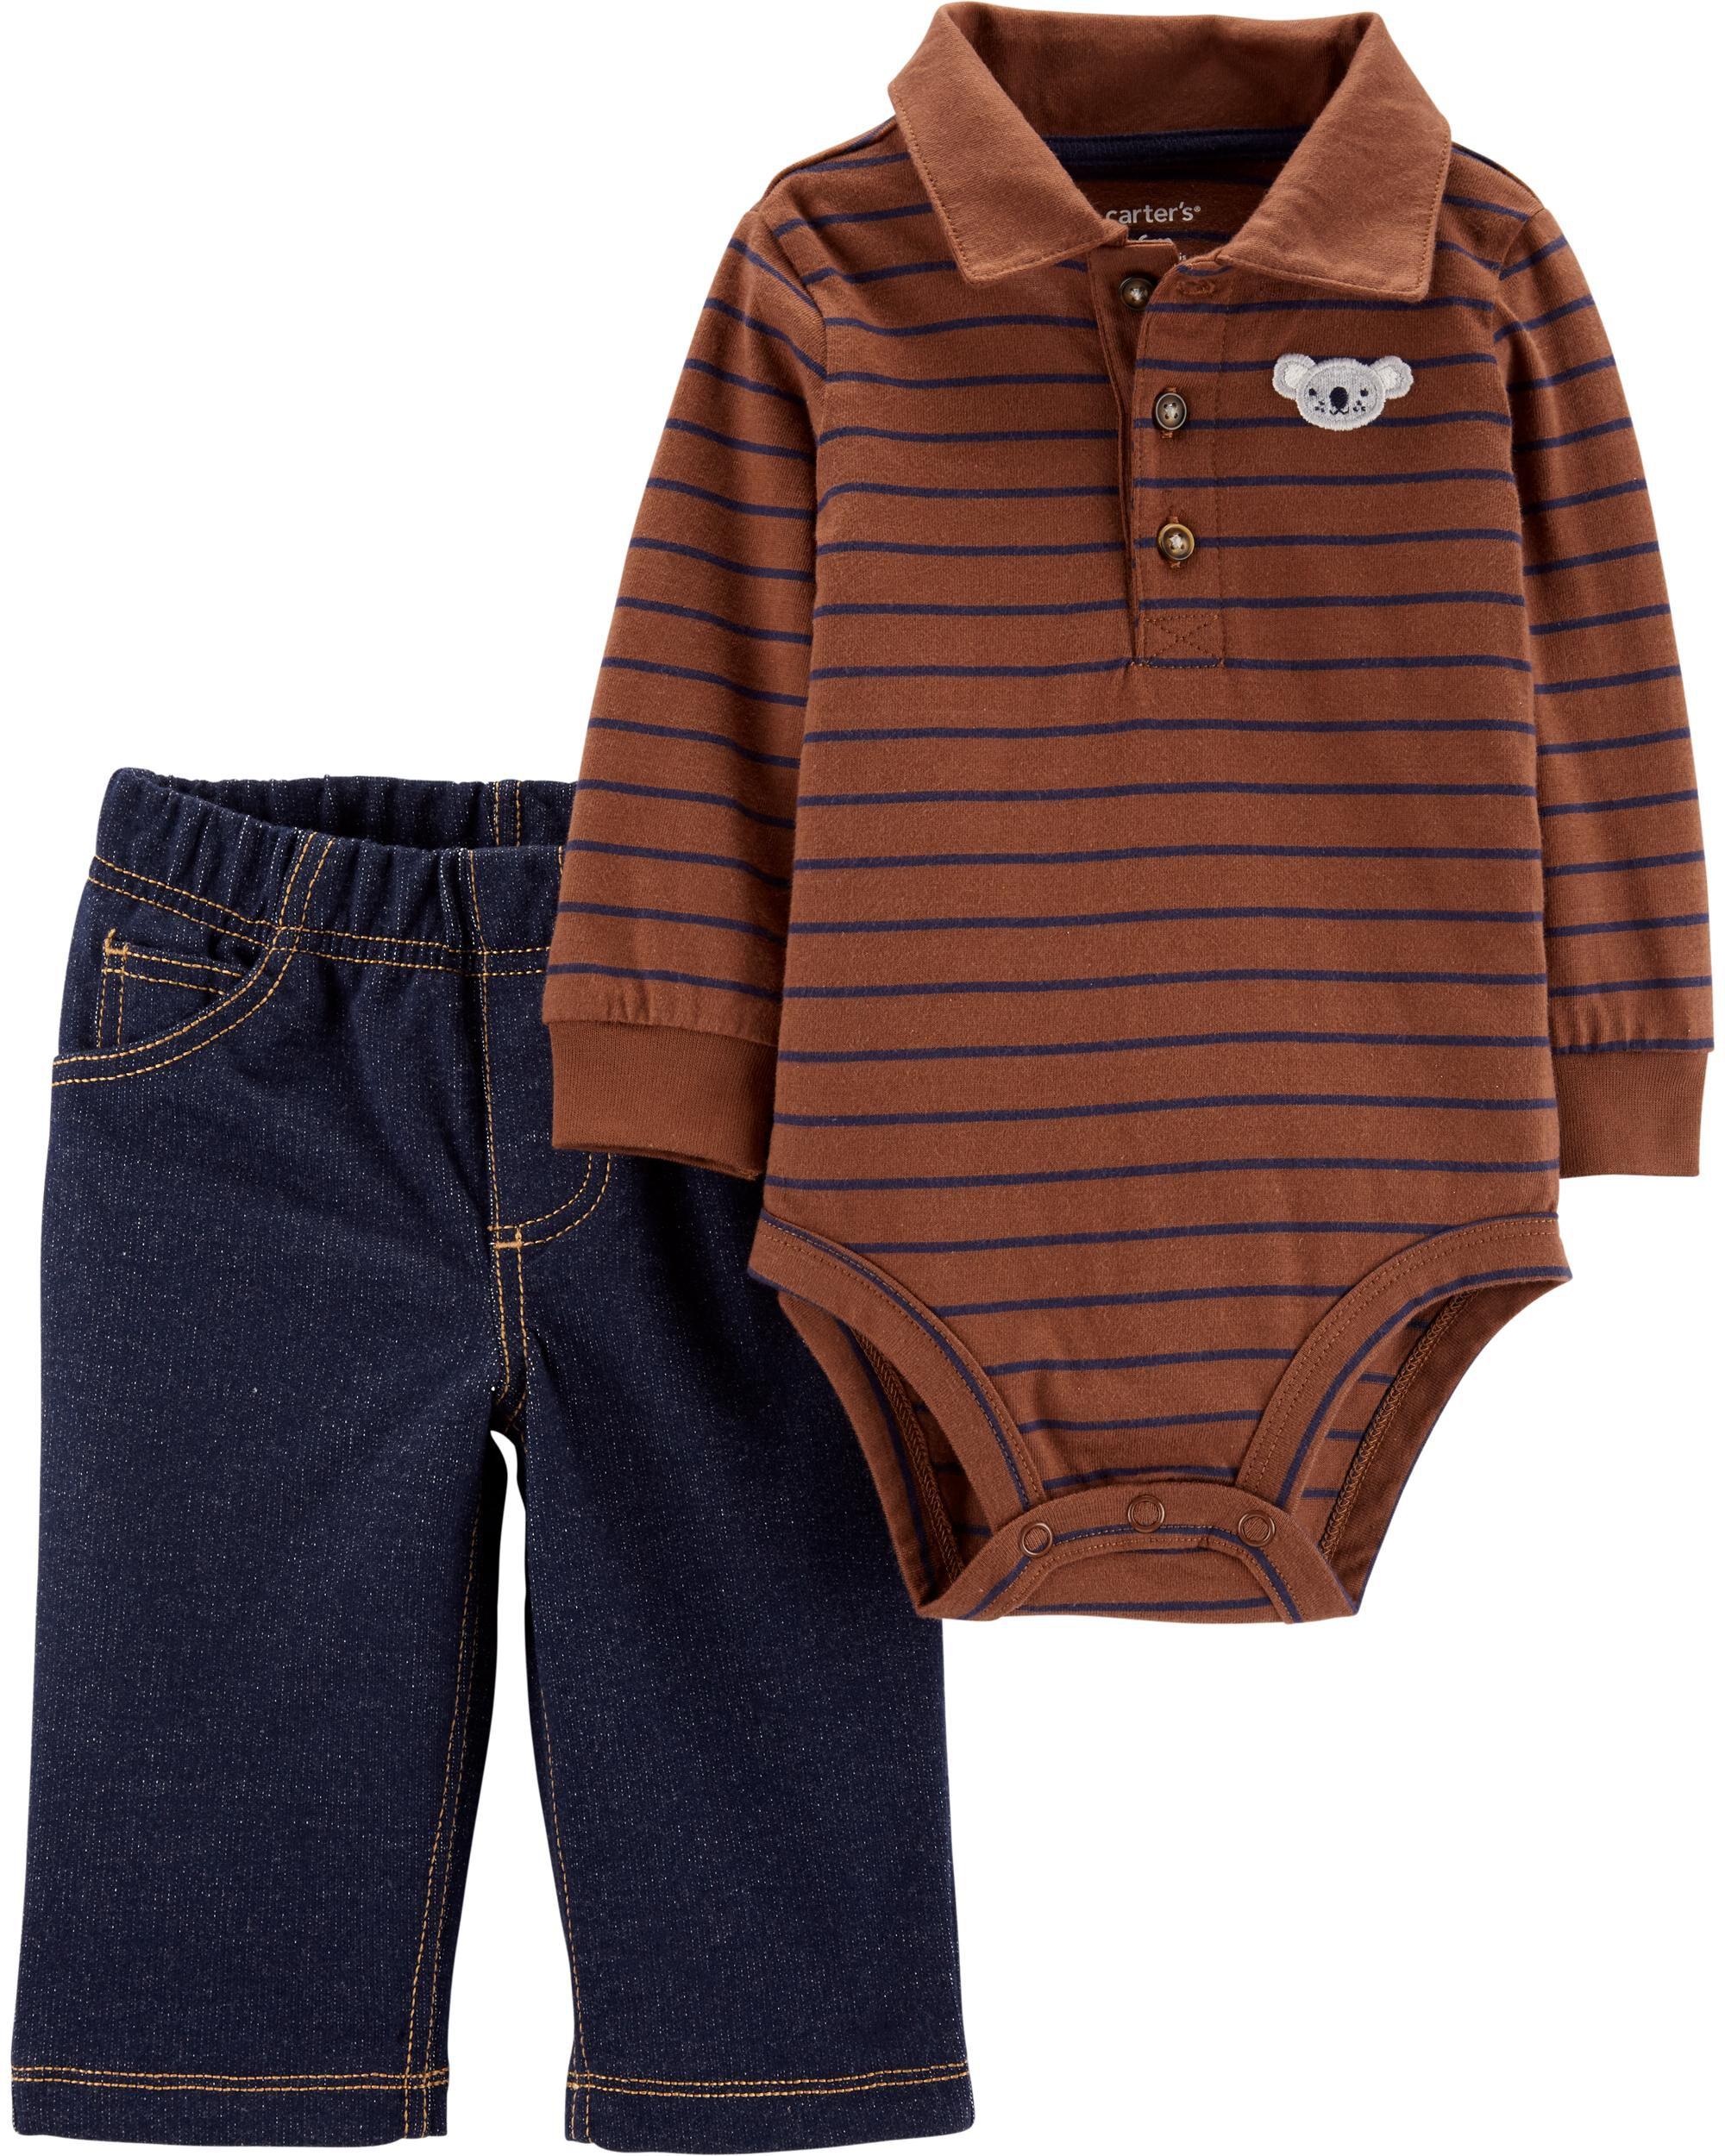 *CLEARANCE* 2-Piece Striped Polo Bodysuit Pant Set